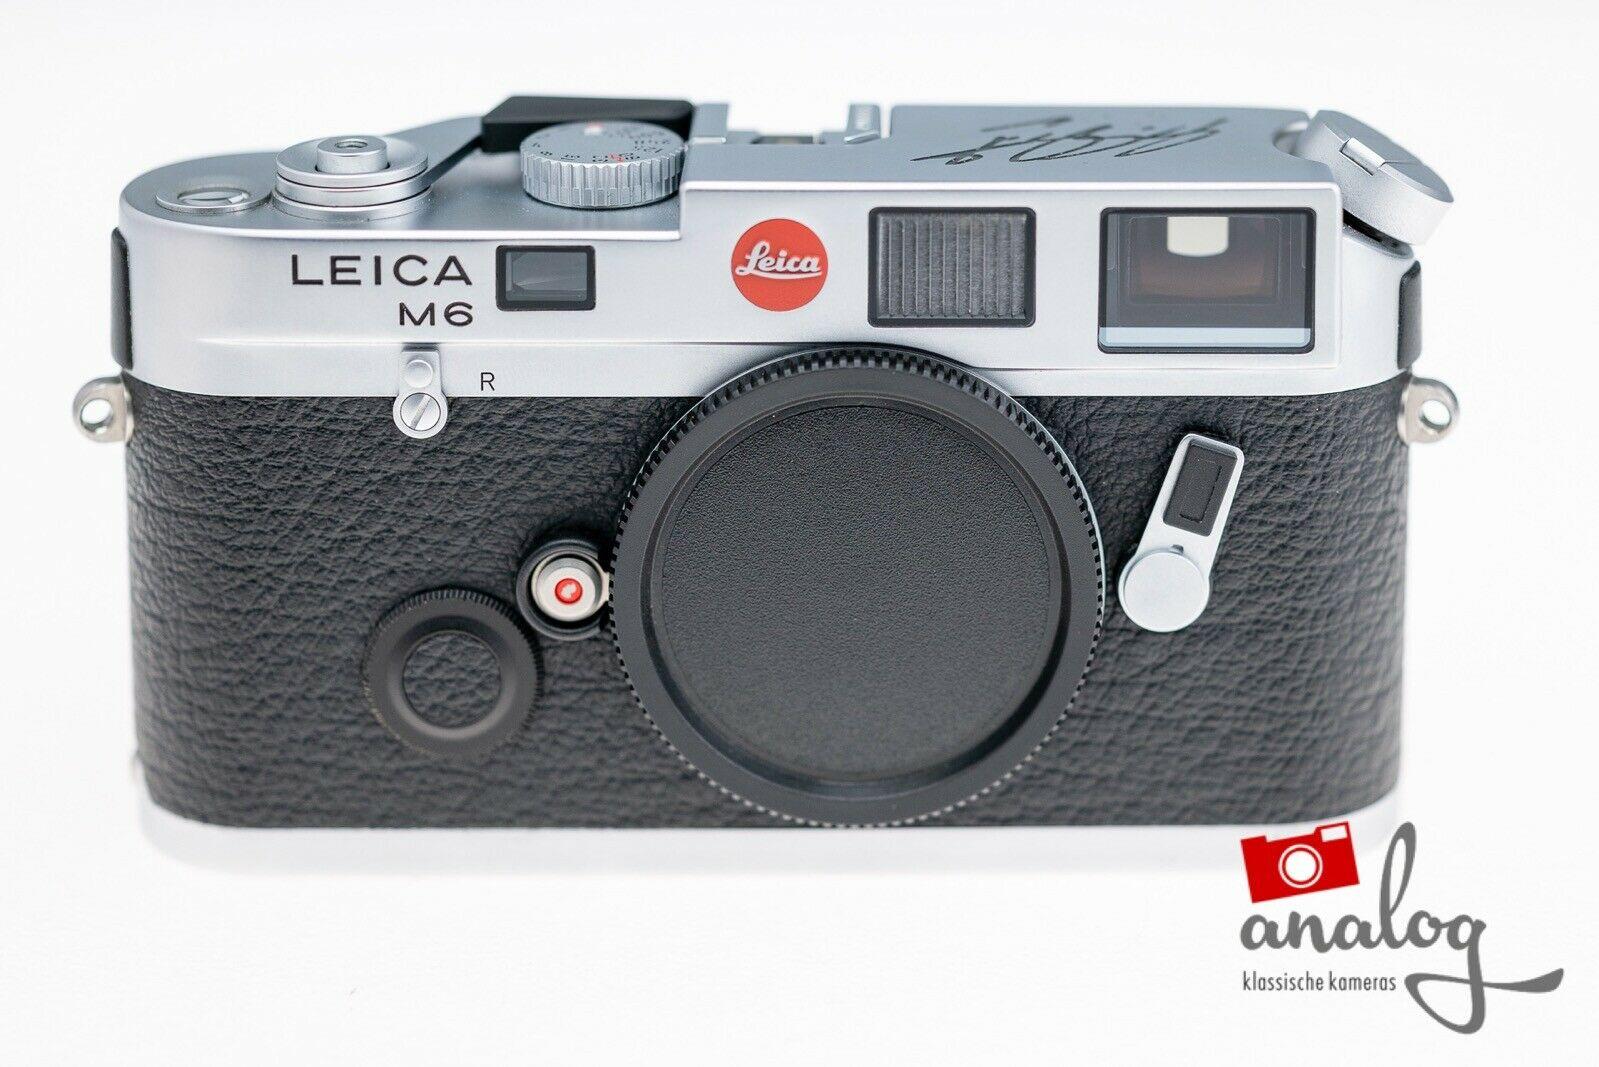 Leica M6 silbern verchromt - 10434